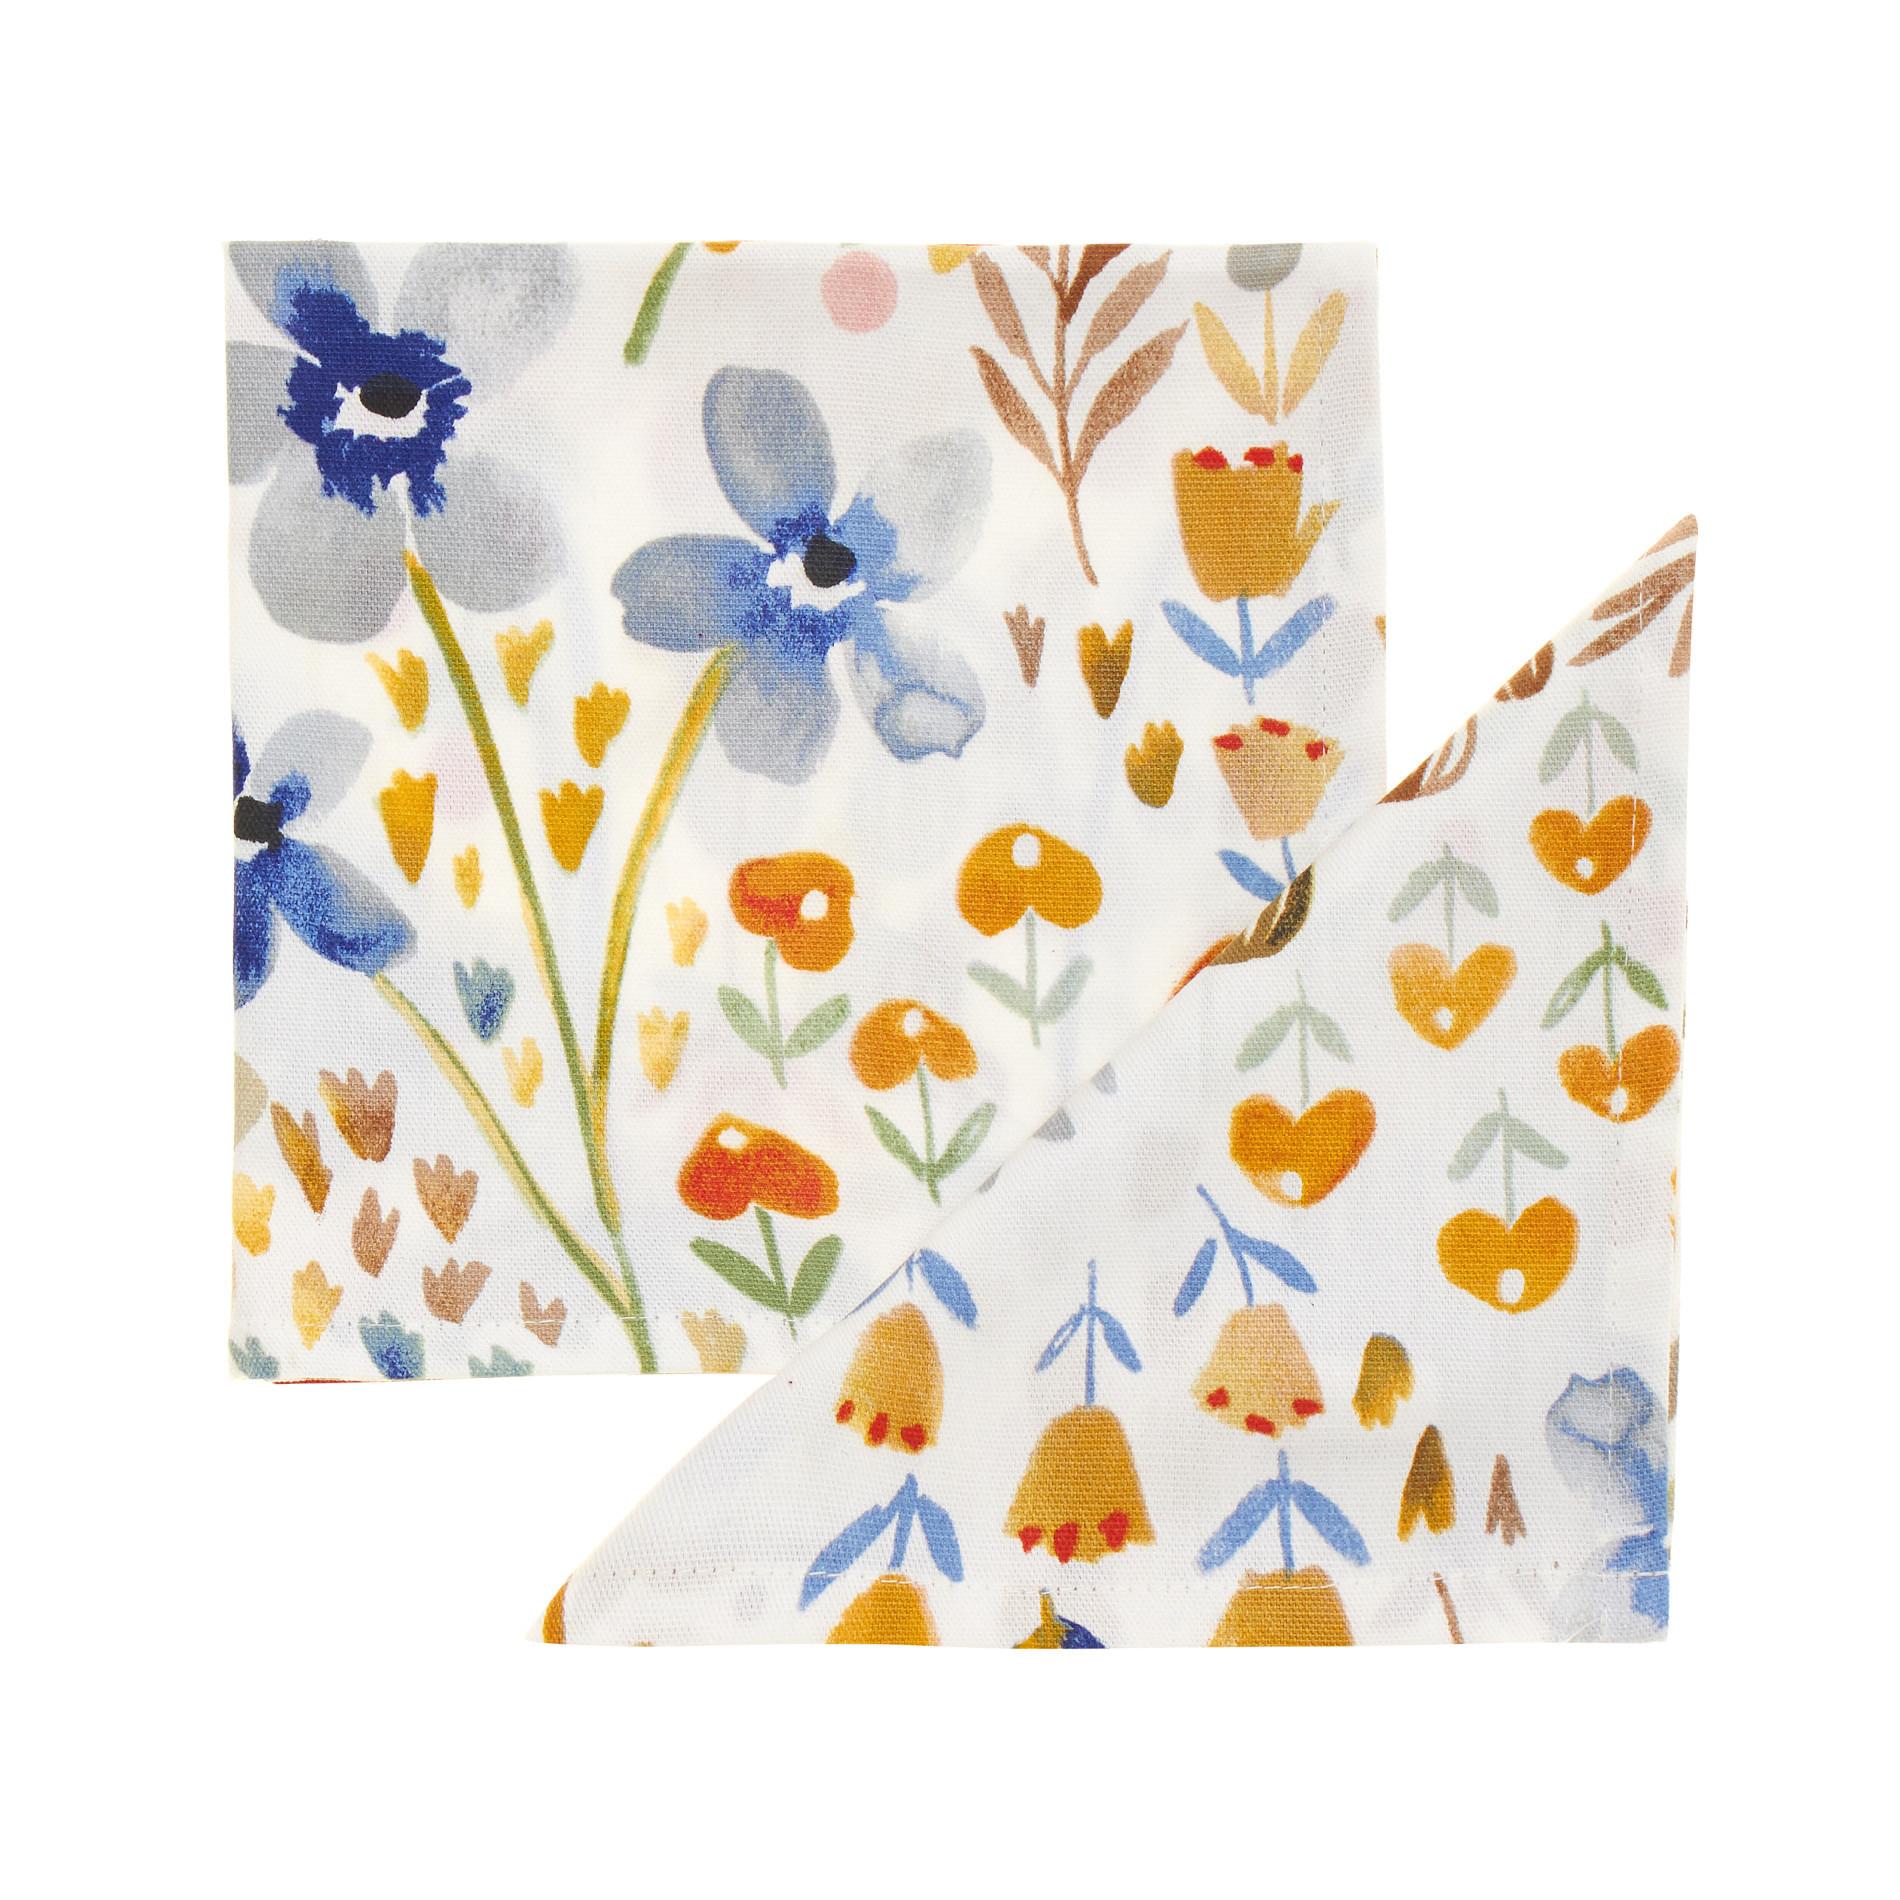 Set due tovaglioli in puro cotone Naif, Multicolor, large image number 0